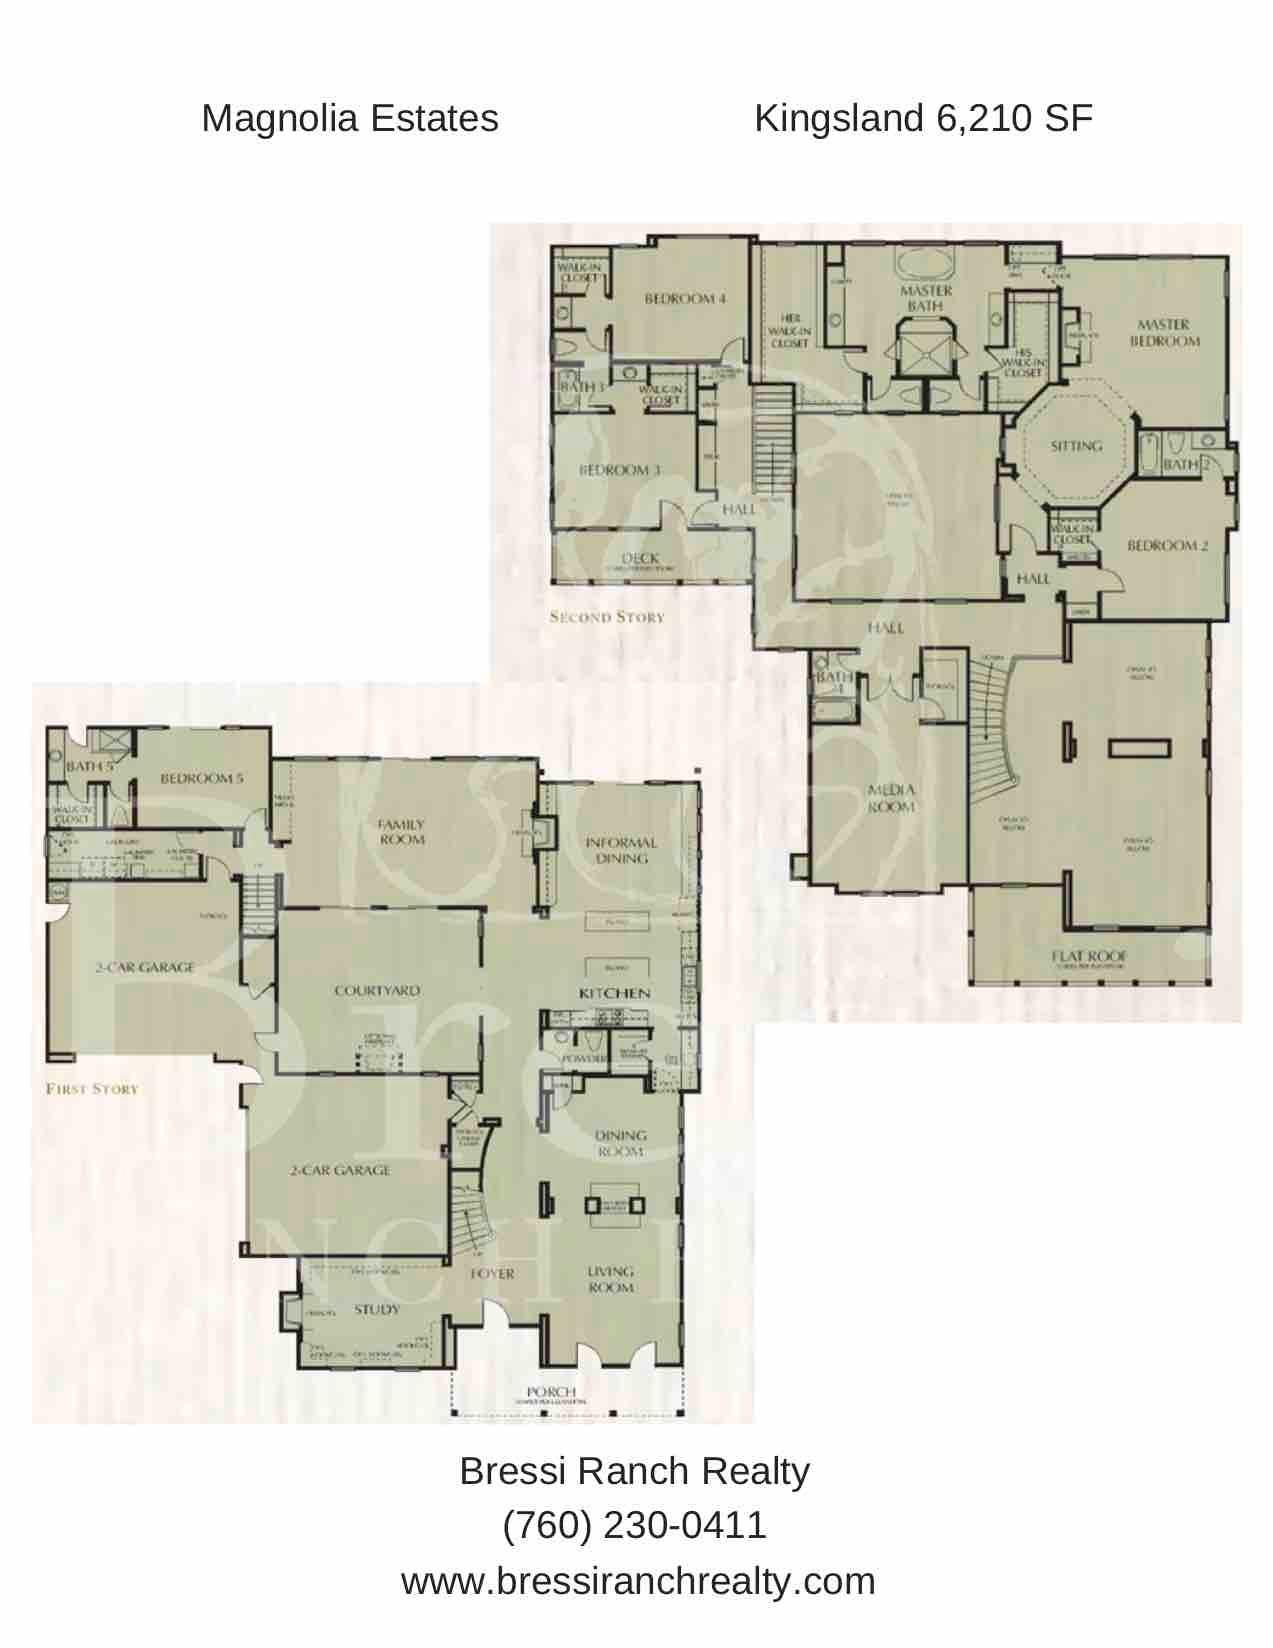 Magnolia Estates Kingsland Floor Plan Bressi Ranch